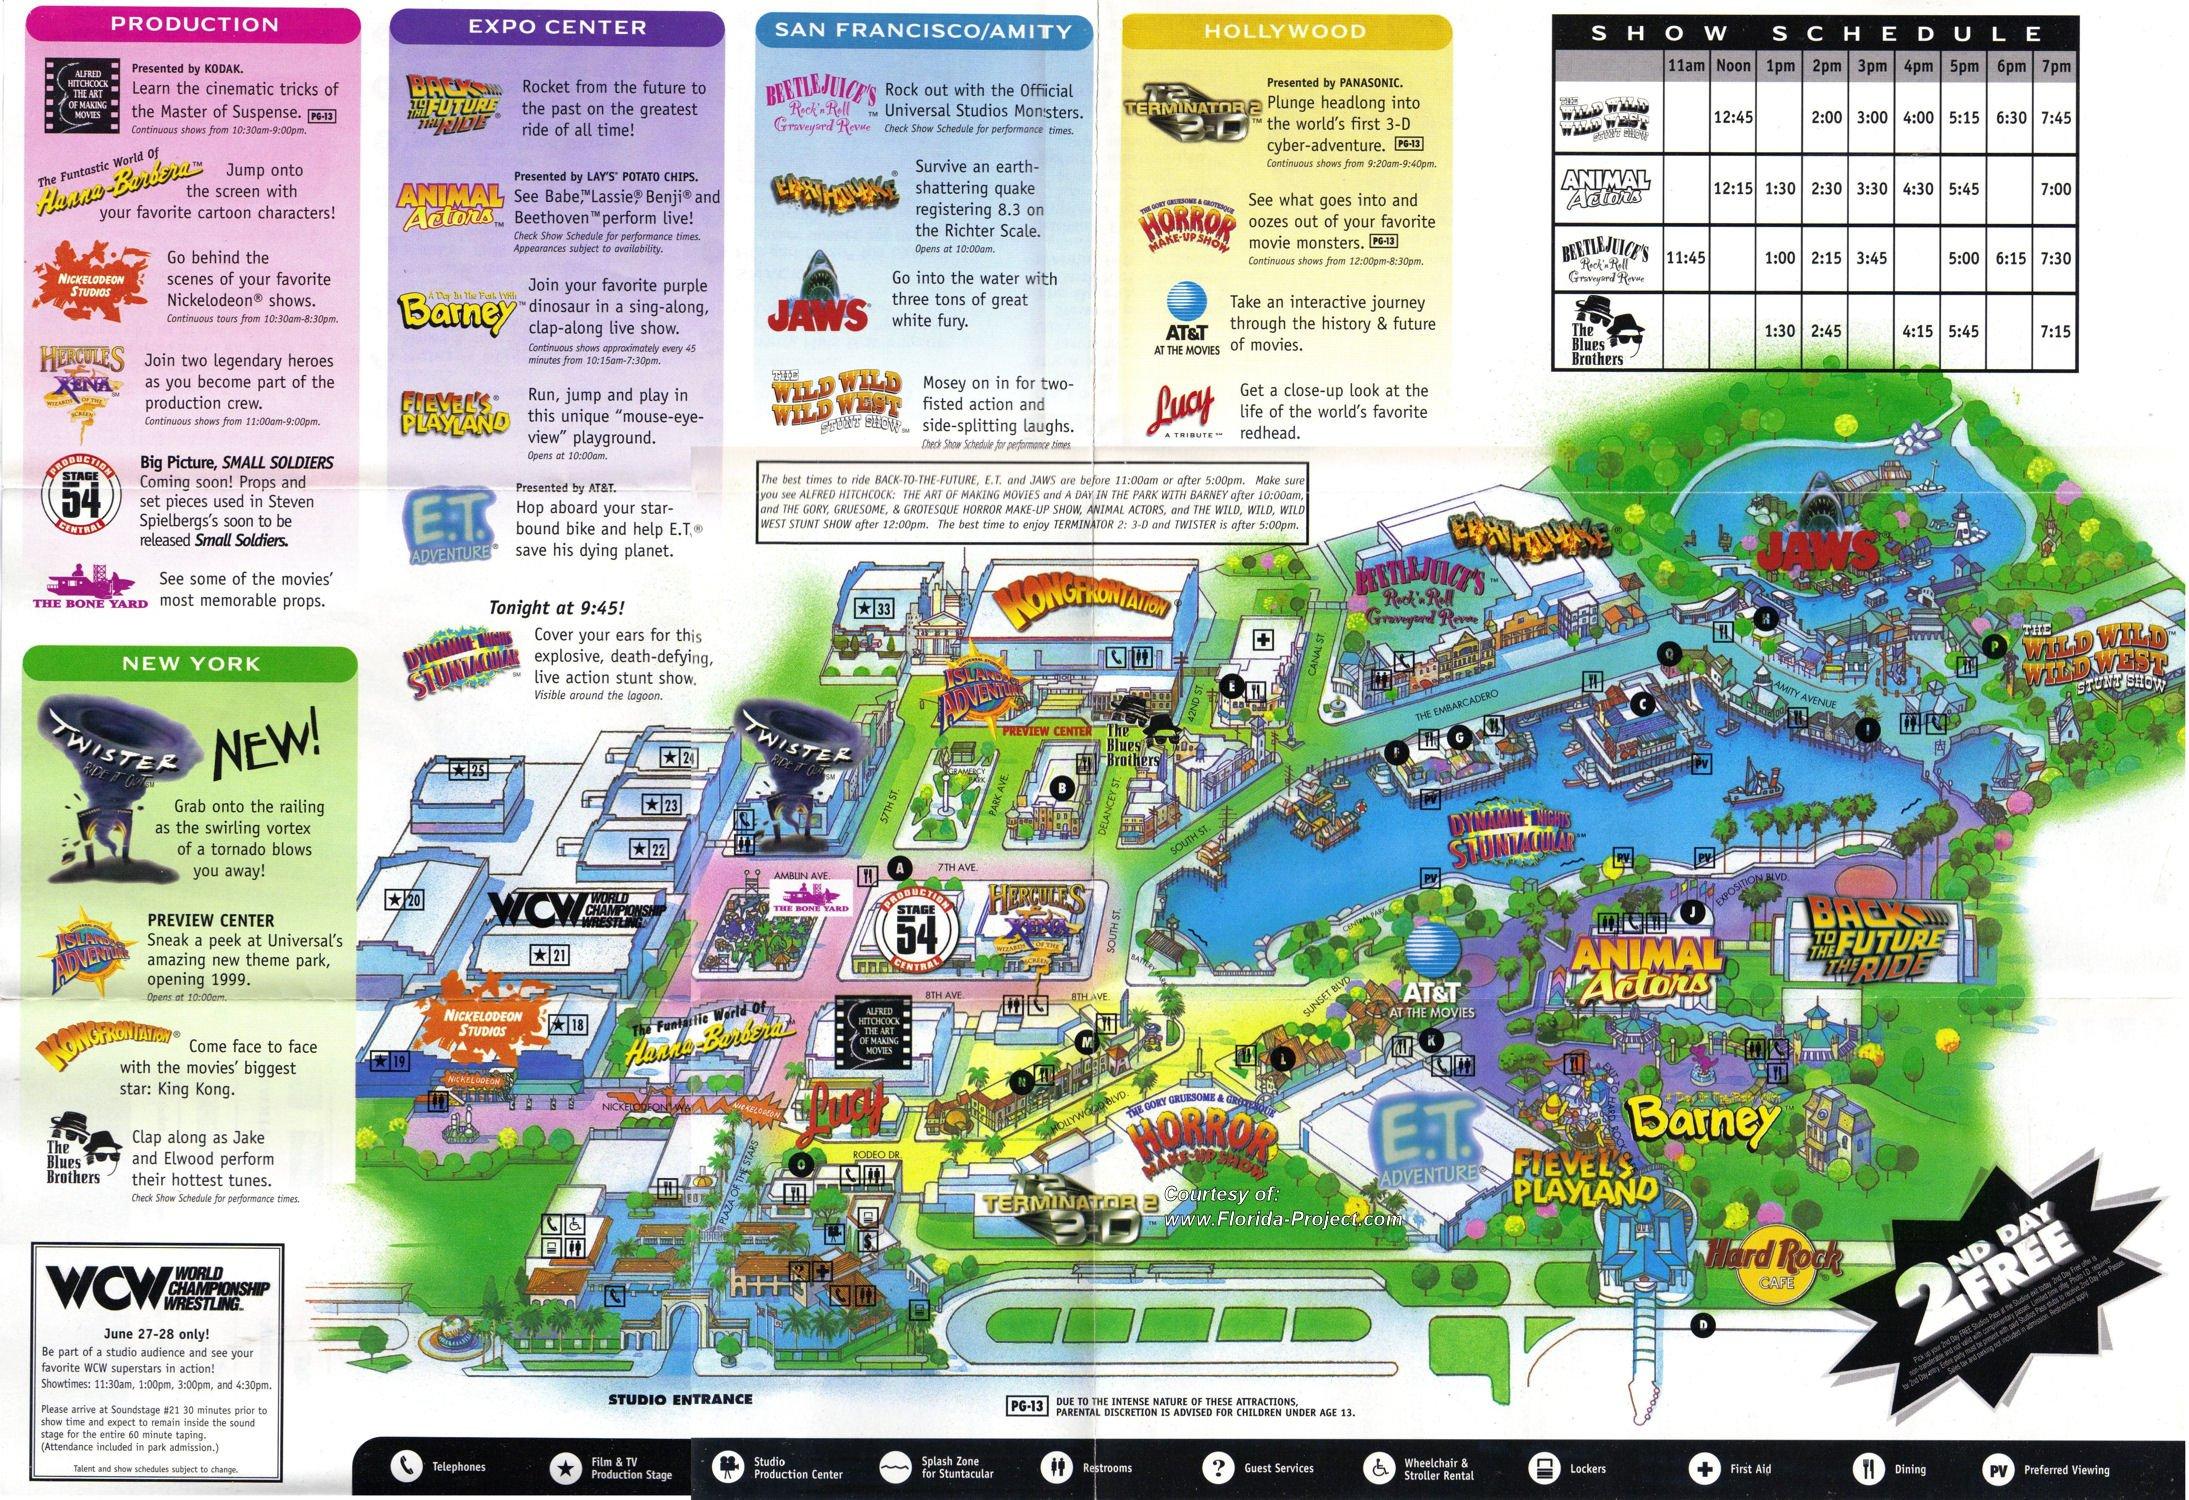 Universal Studios Florida Map 2018 From Ambergontrail 4 - Ameliabd - Universal Studios Florida Map 2018